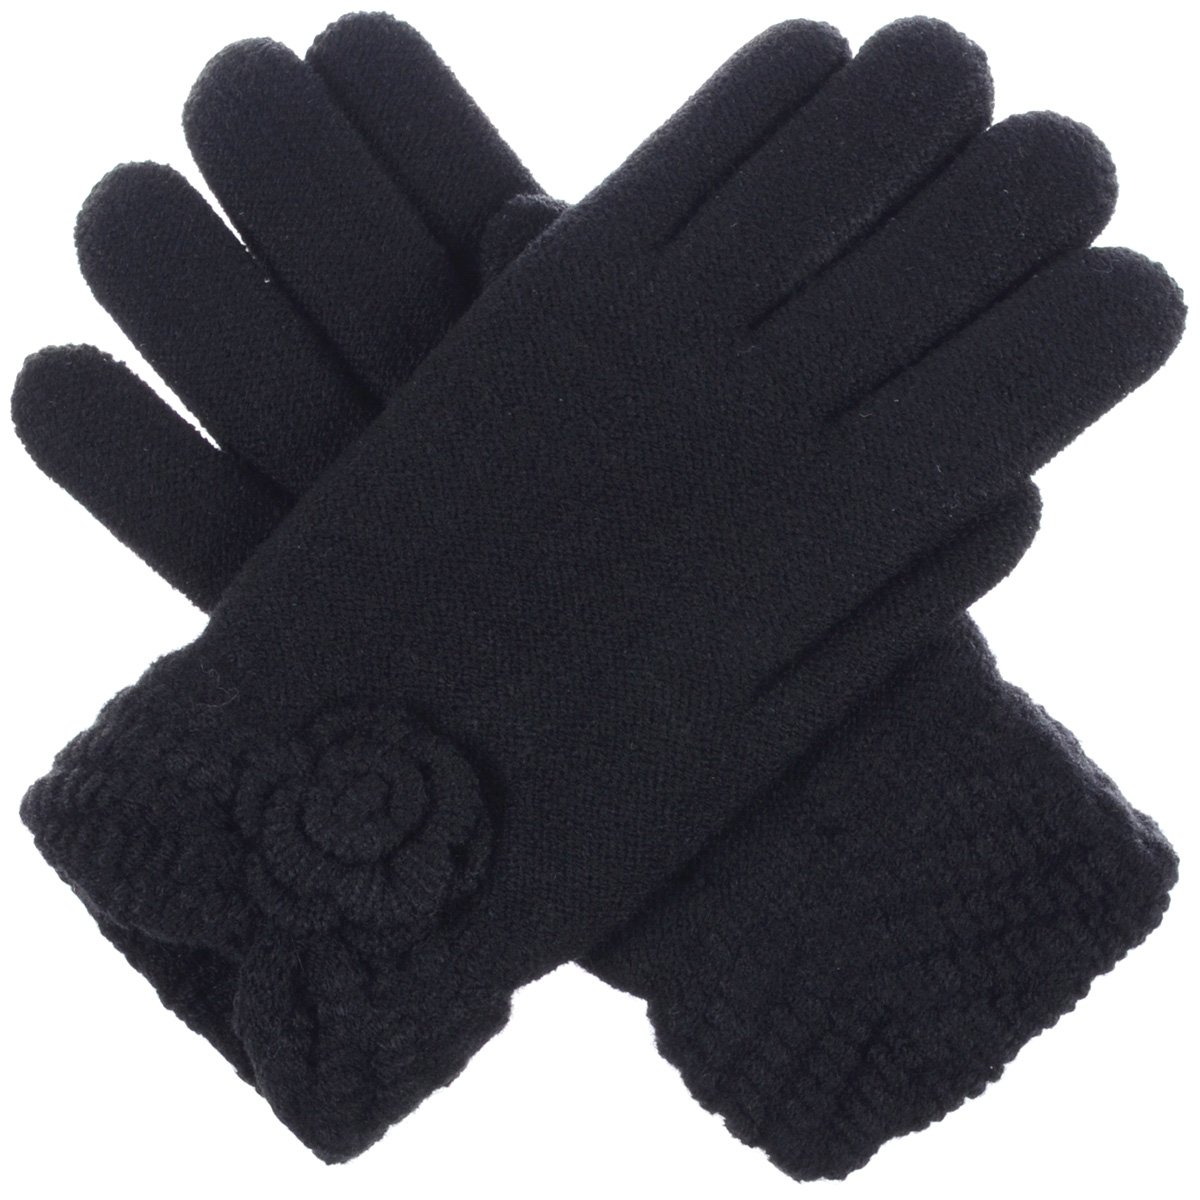 BYOS Womens Winter Ultra Warm Soft Plush Faux Fur Fleece Lined Knit Gloves W/Flower V Opening Cuff (Black)